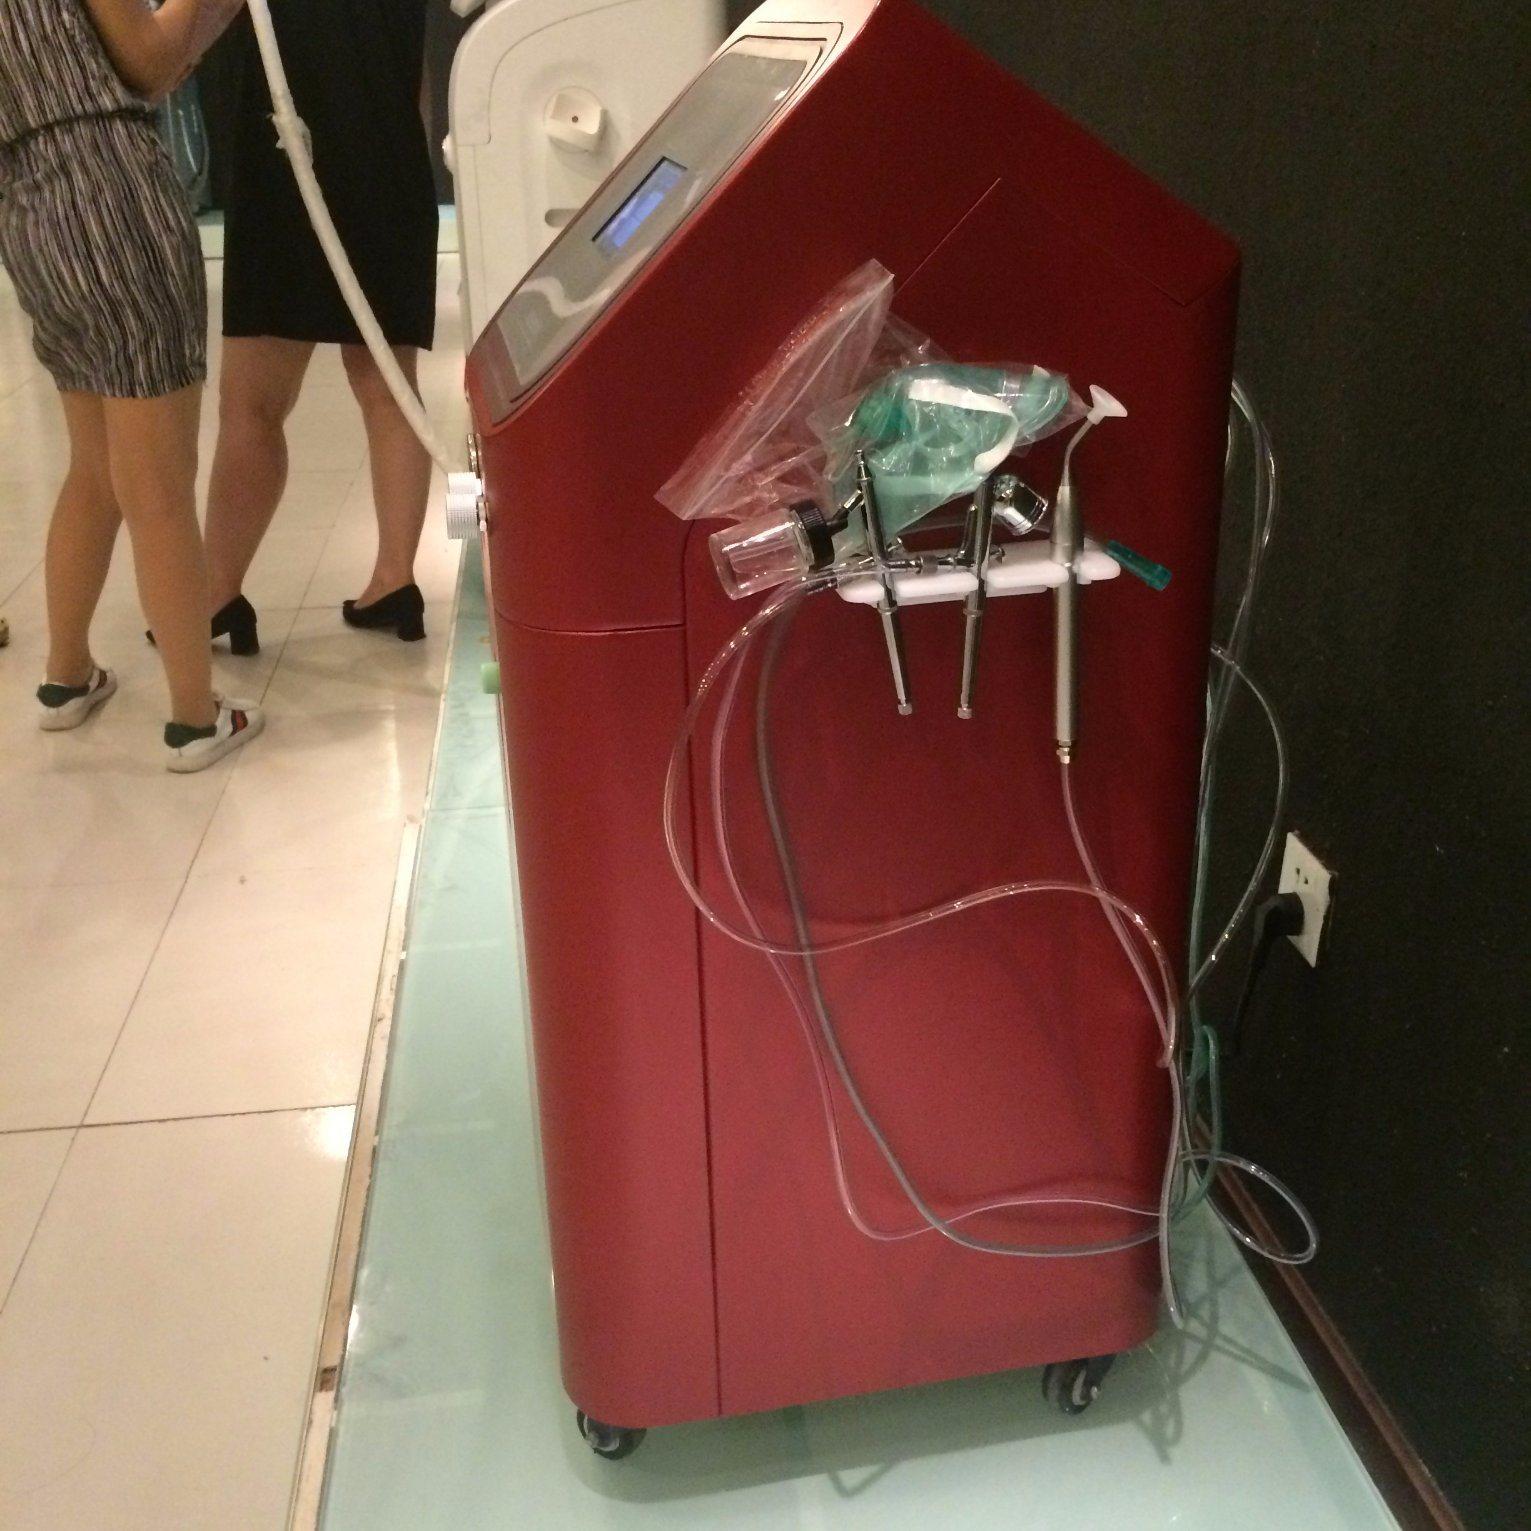 Oxygen Facial Skin Care Beauty Salon Machine